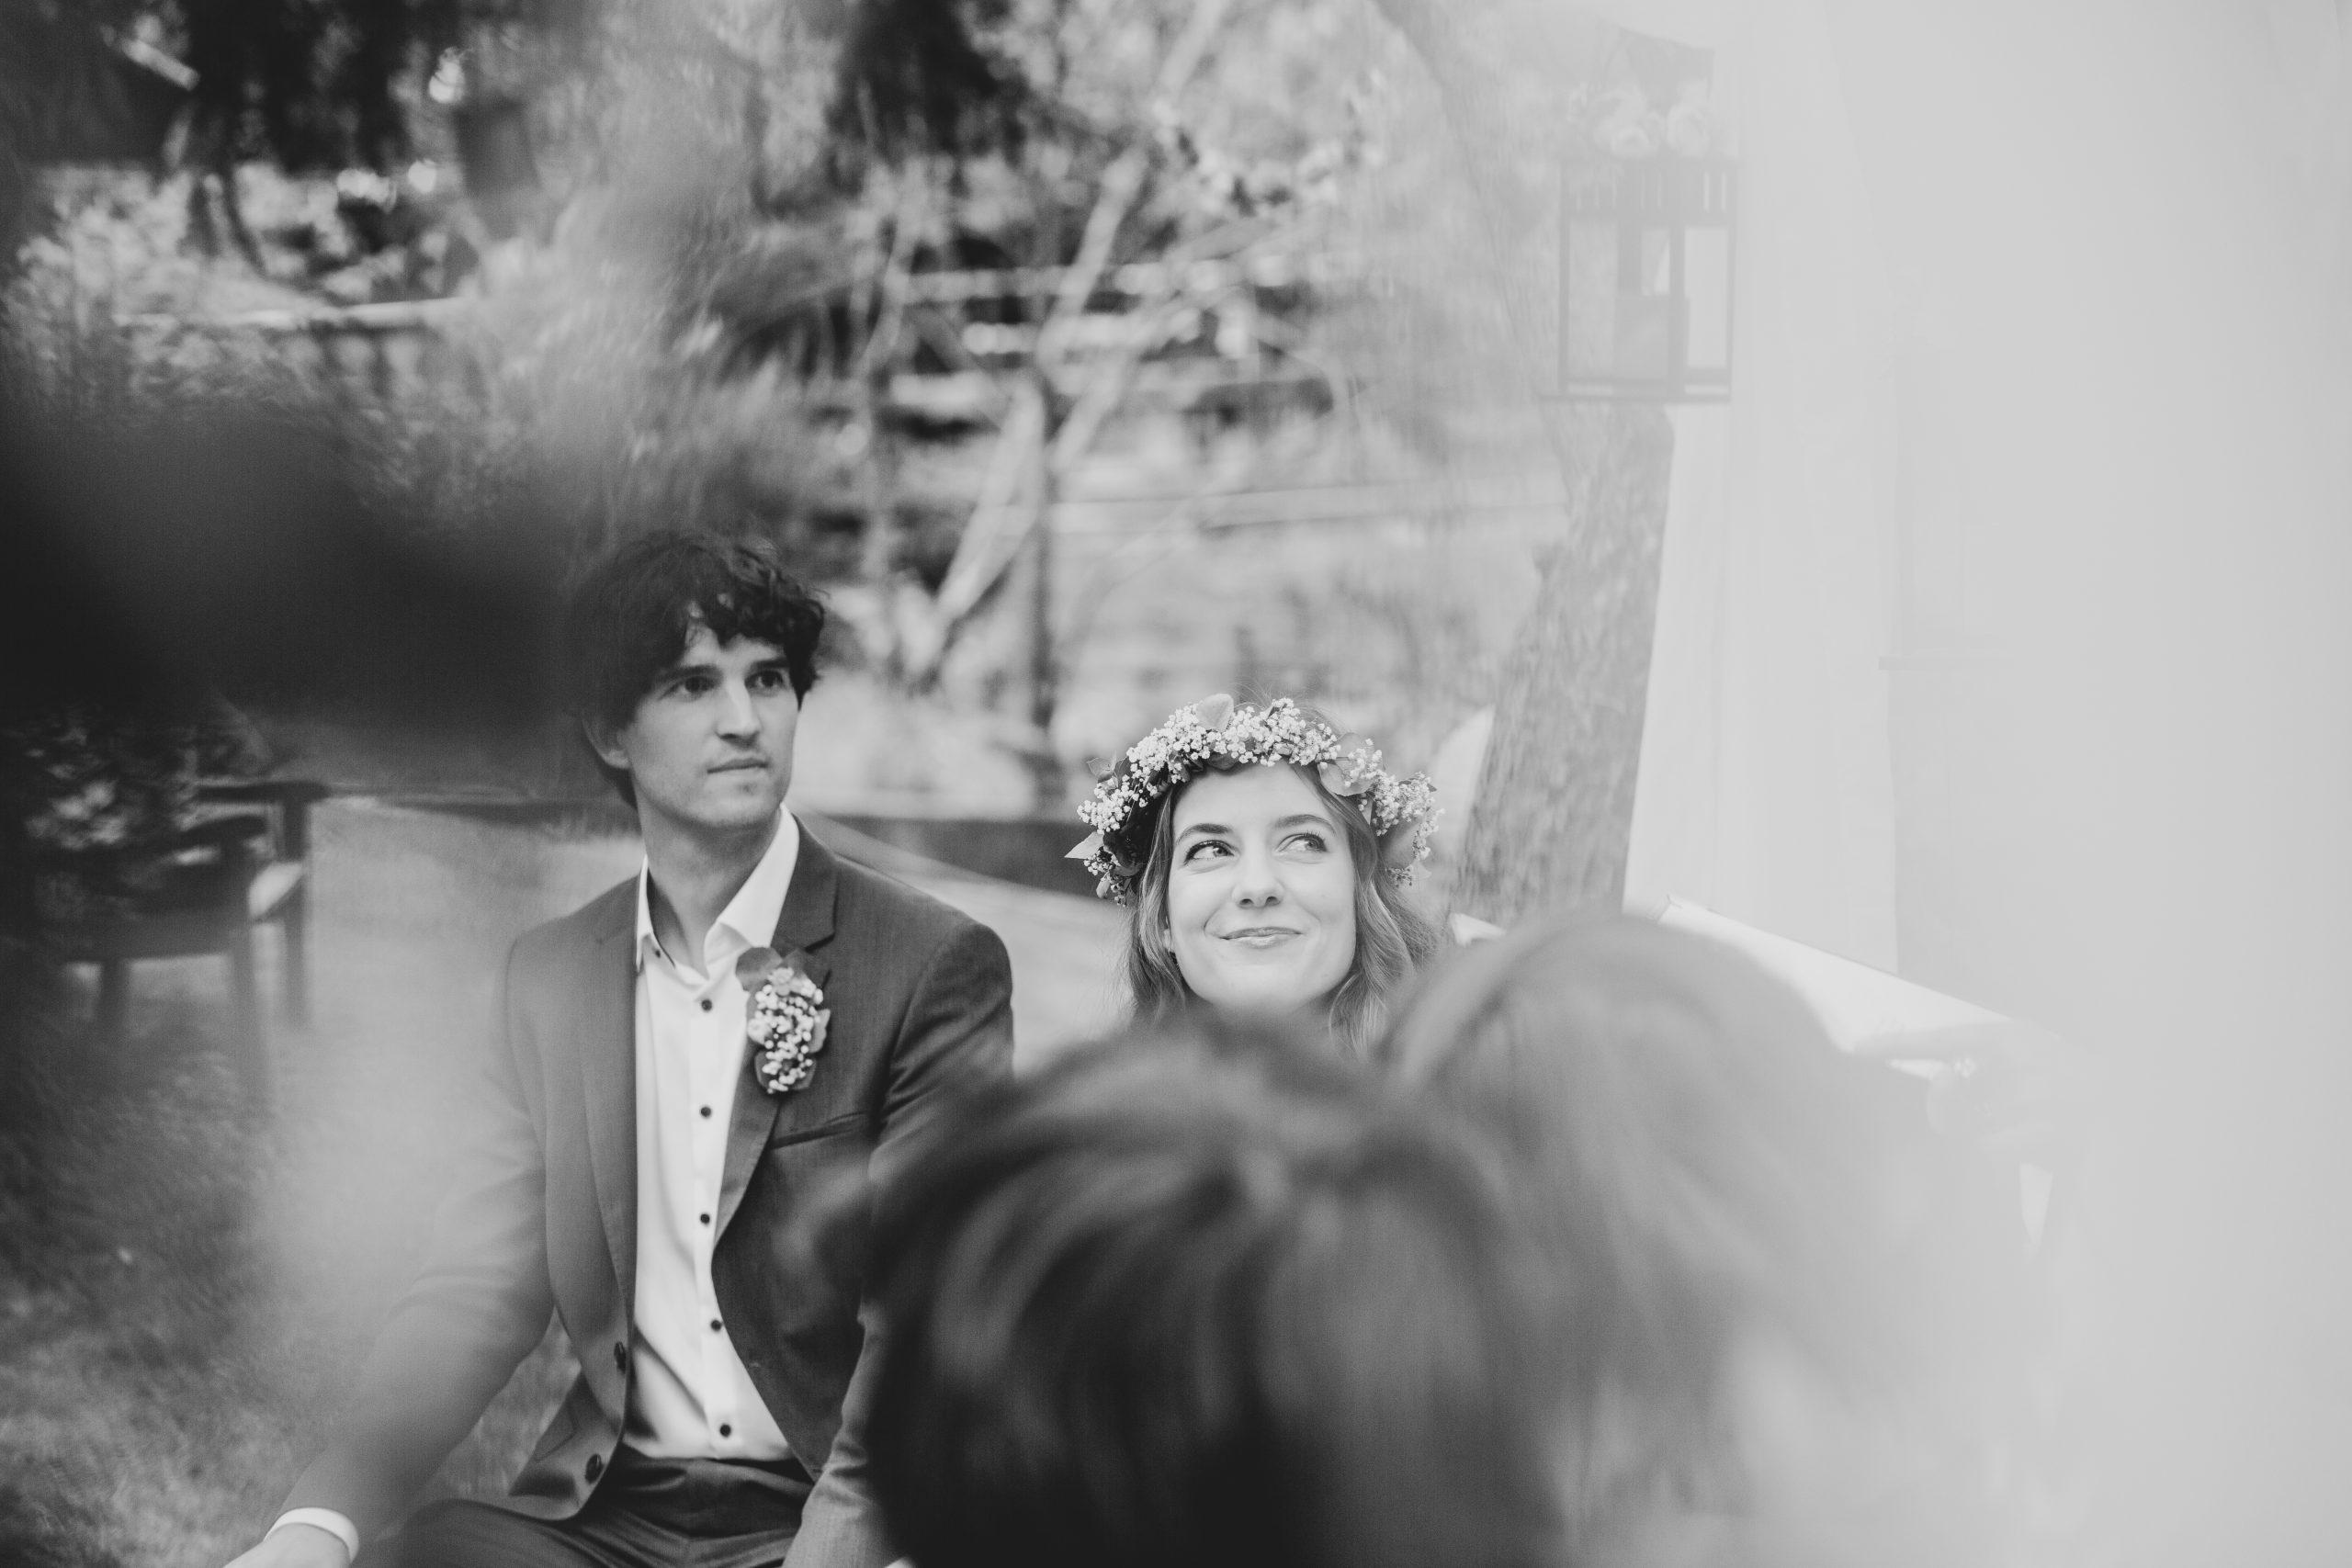 WeddingDream_FabulouSky Studio Christina Hein Photography